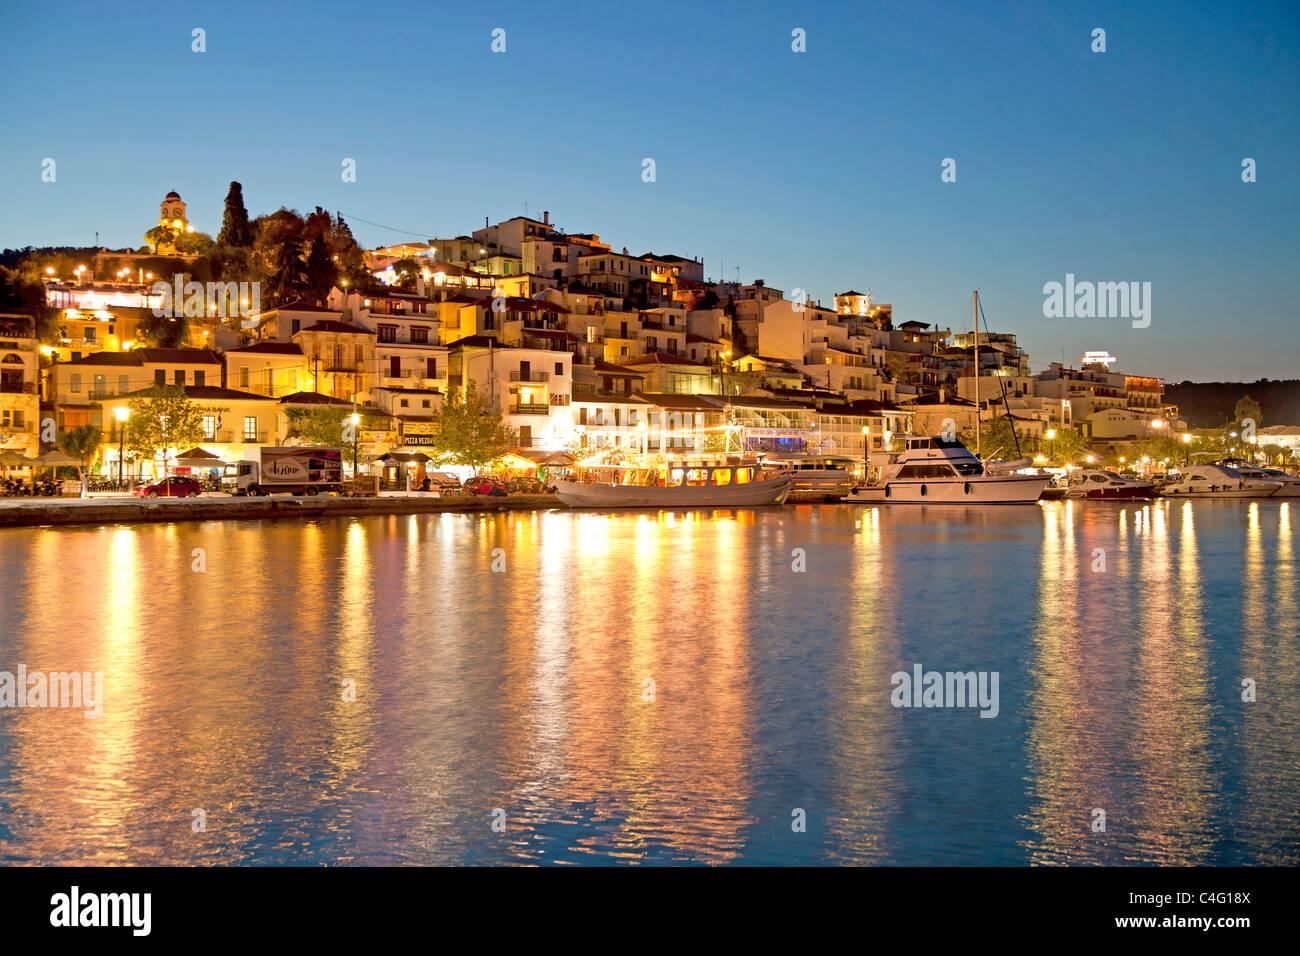 cityscape Skiathos Townduring the Blue hour on Skiathos Island, Northern Sporades, Greece Stock Photo